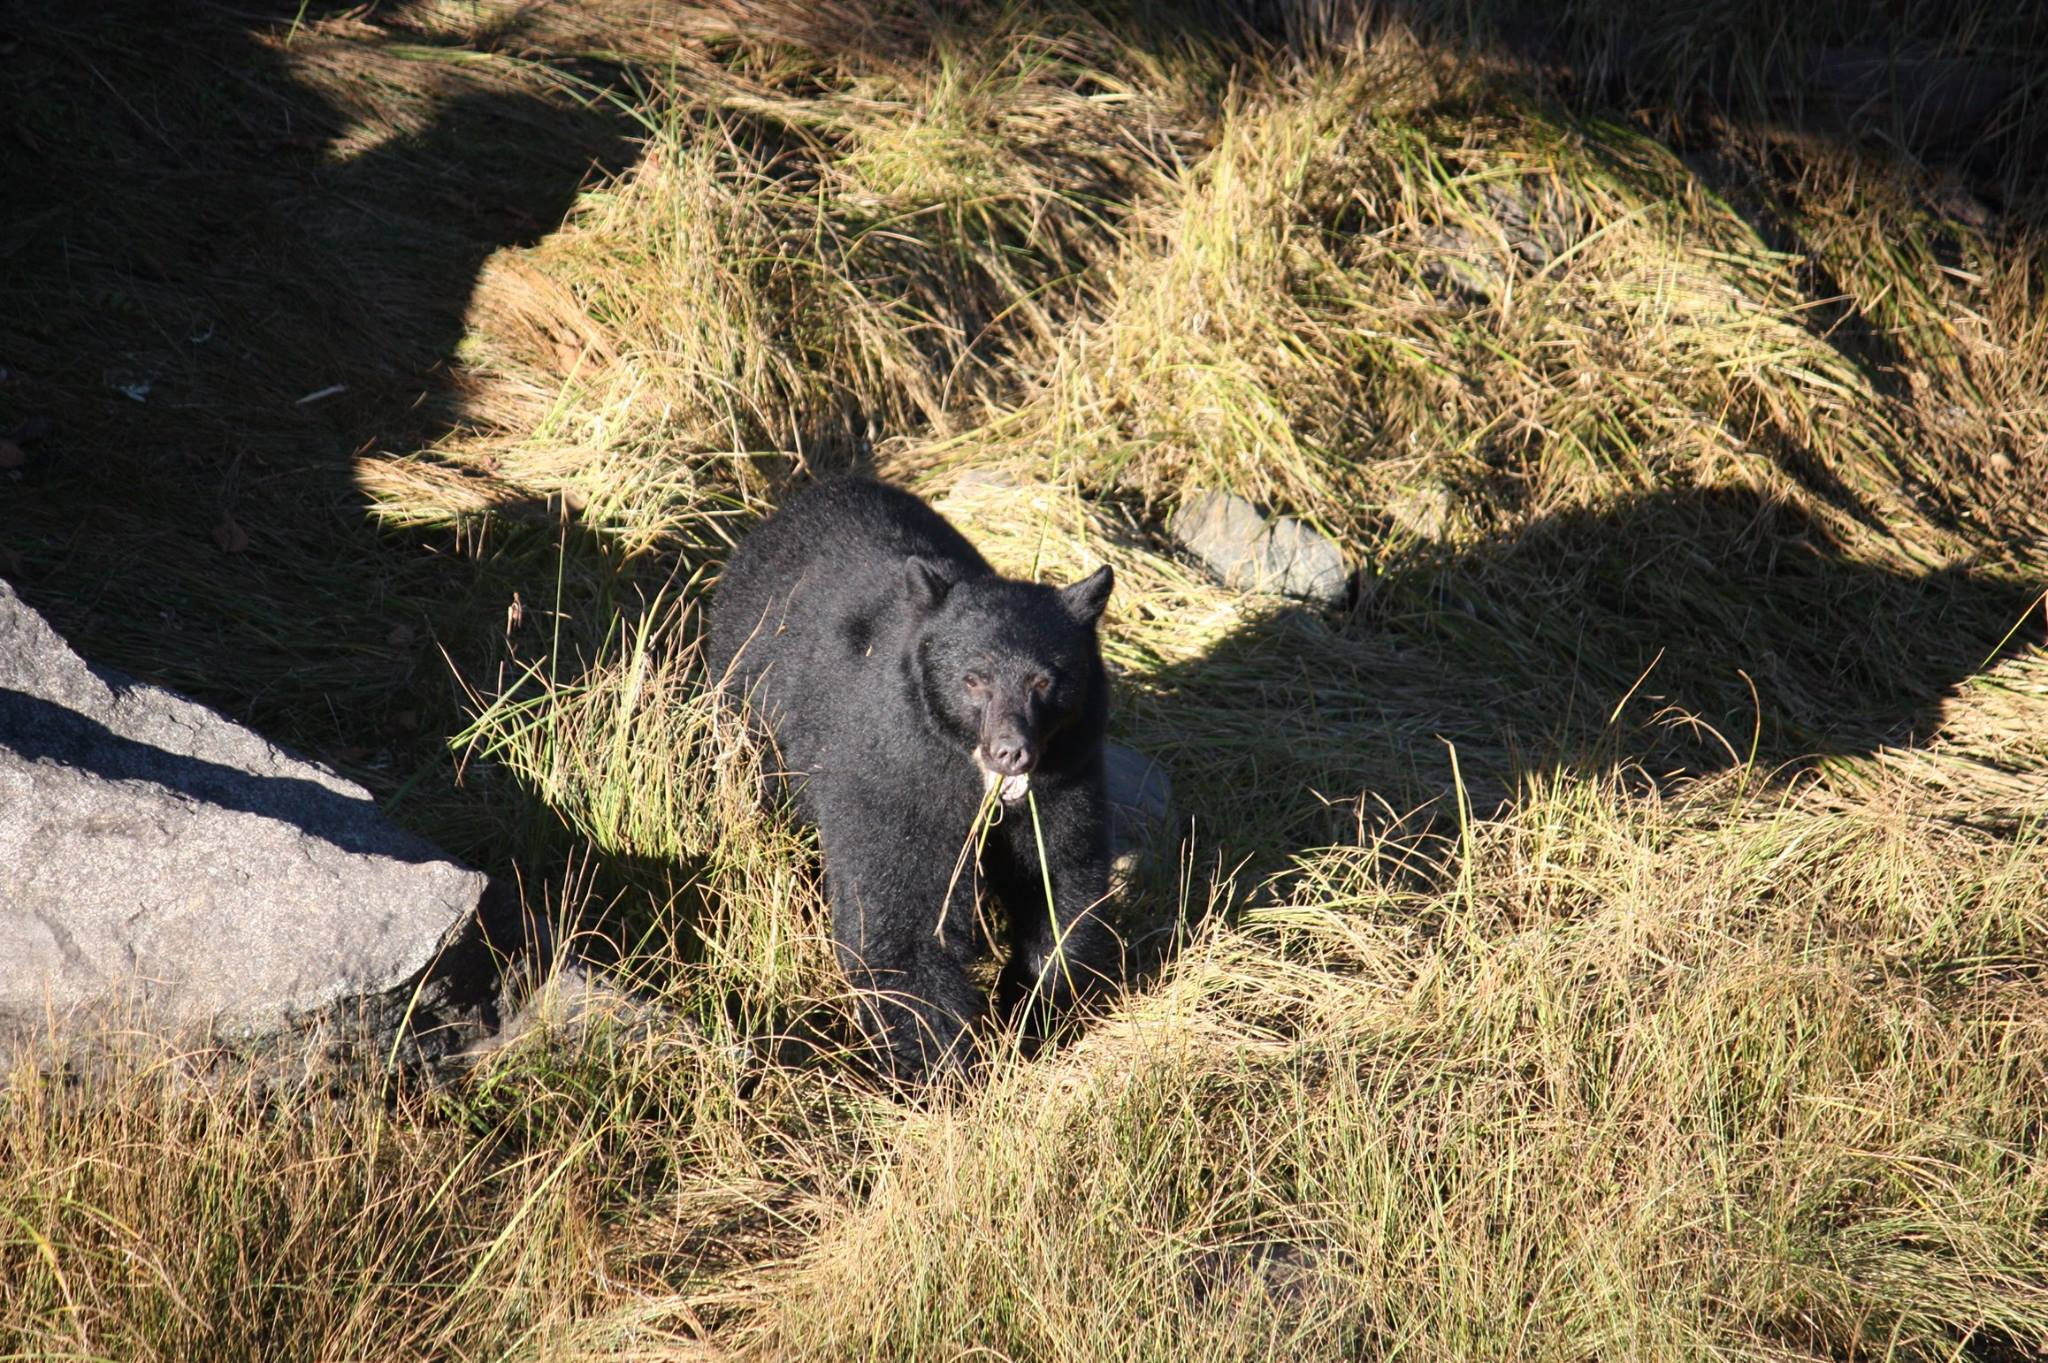 Bear in Salmon Beach_taken from SBV facebook page.jpg